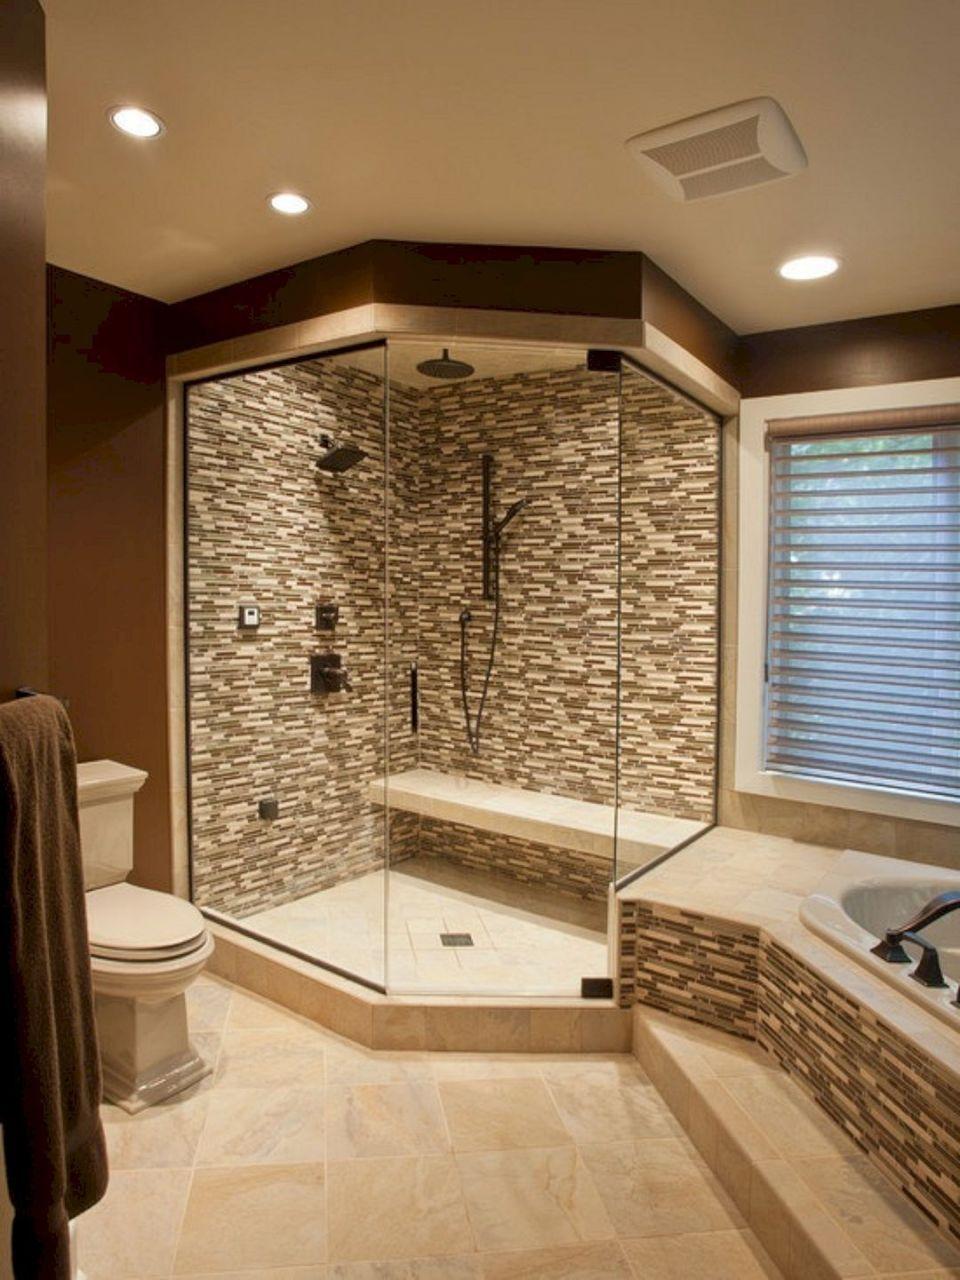 the best diy master bathroom ideas remodel on a budget no on bathroom renovation ideas on a budget id=98059